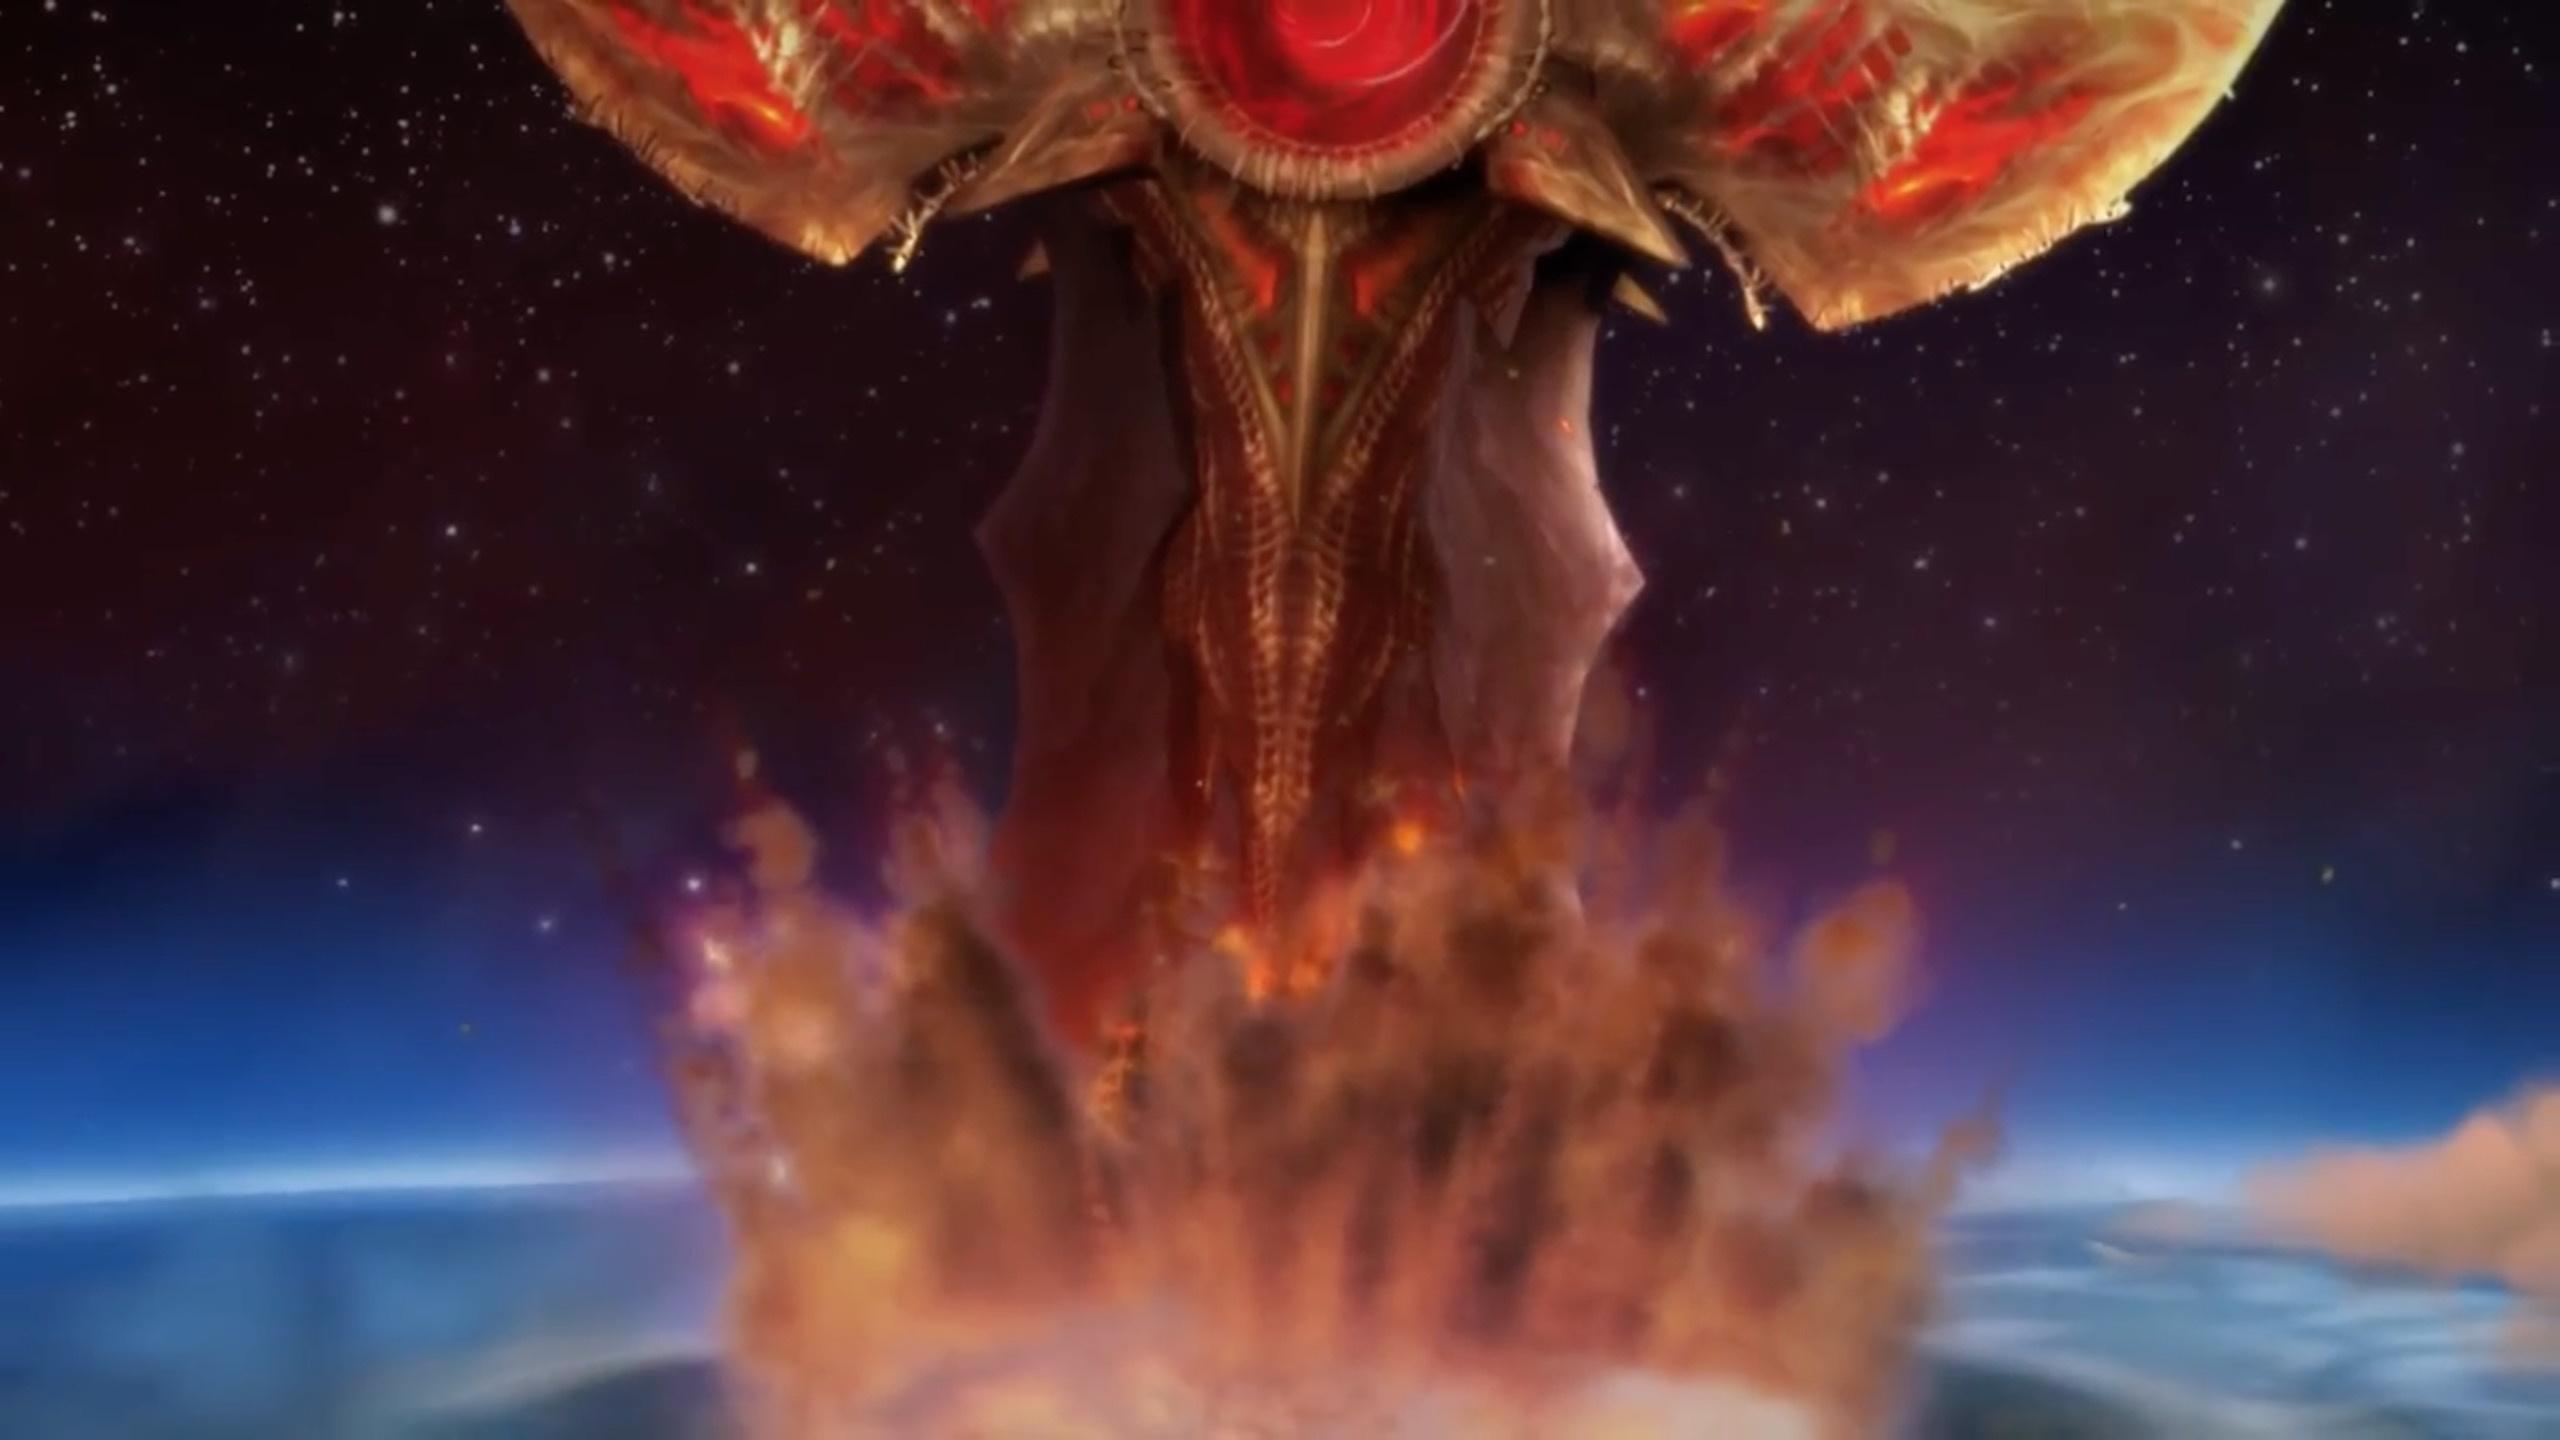 Sword Of Thenew World: Sargeras' Sword Impact On Azeroth?